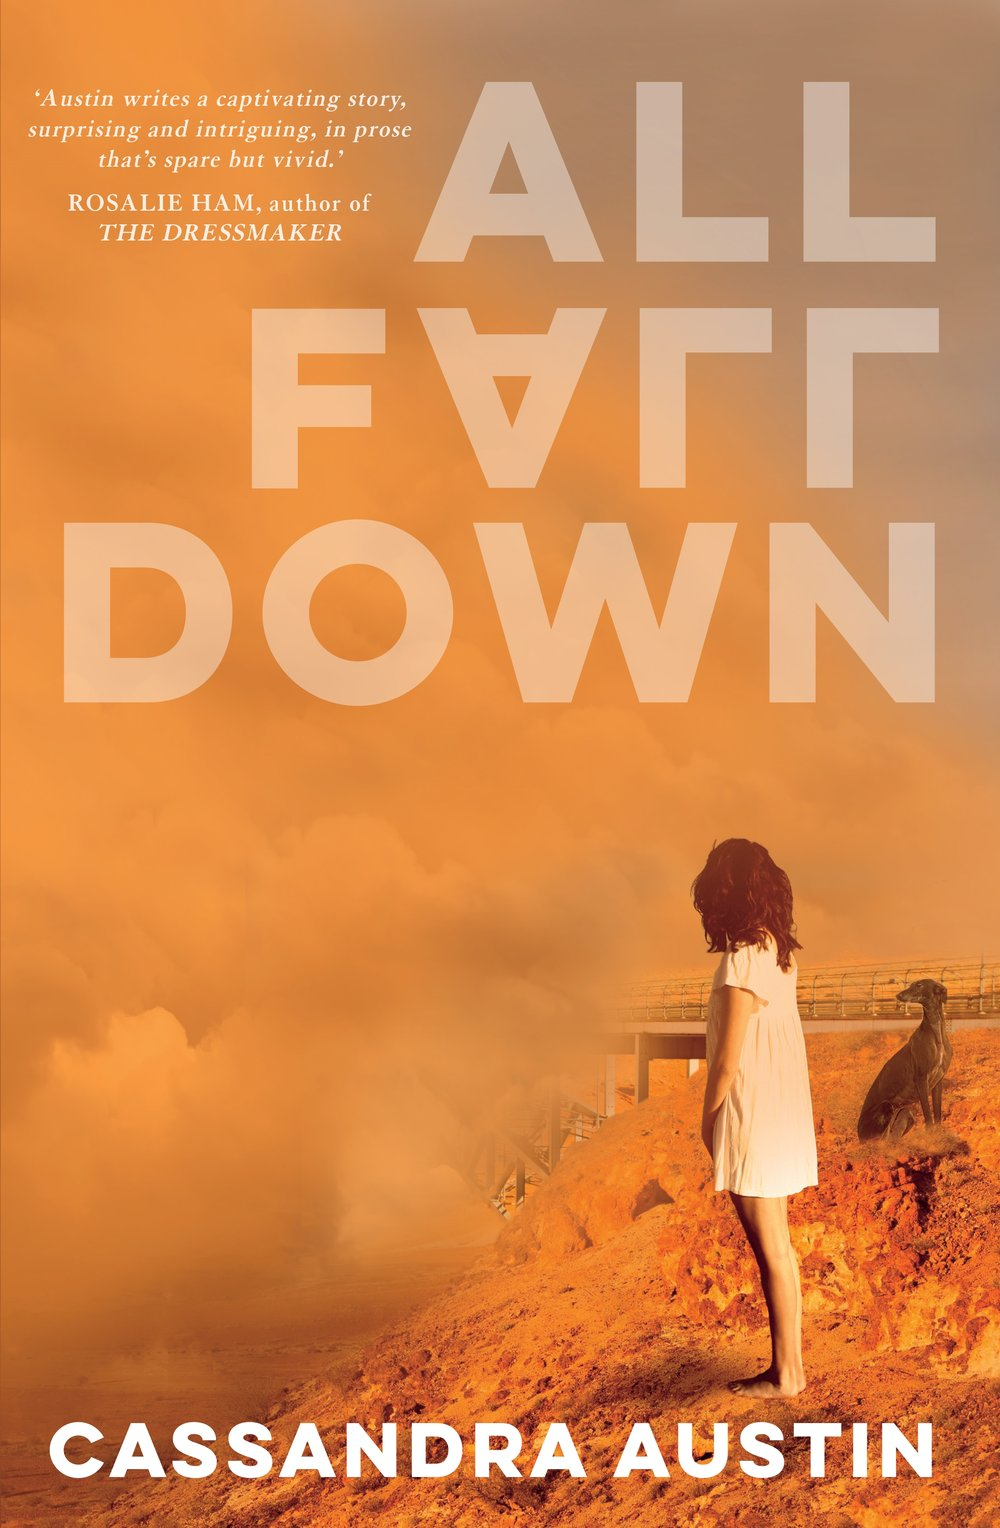 All Fall DownCassandra Austin Rating: 5 / 5 - Cassandra Austin Rating: 5 / 5